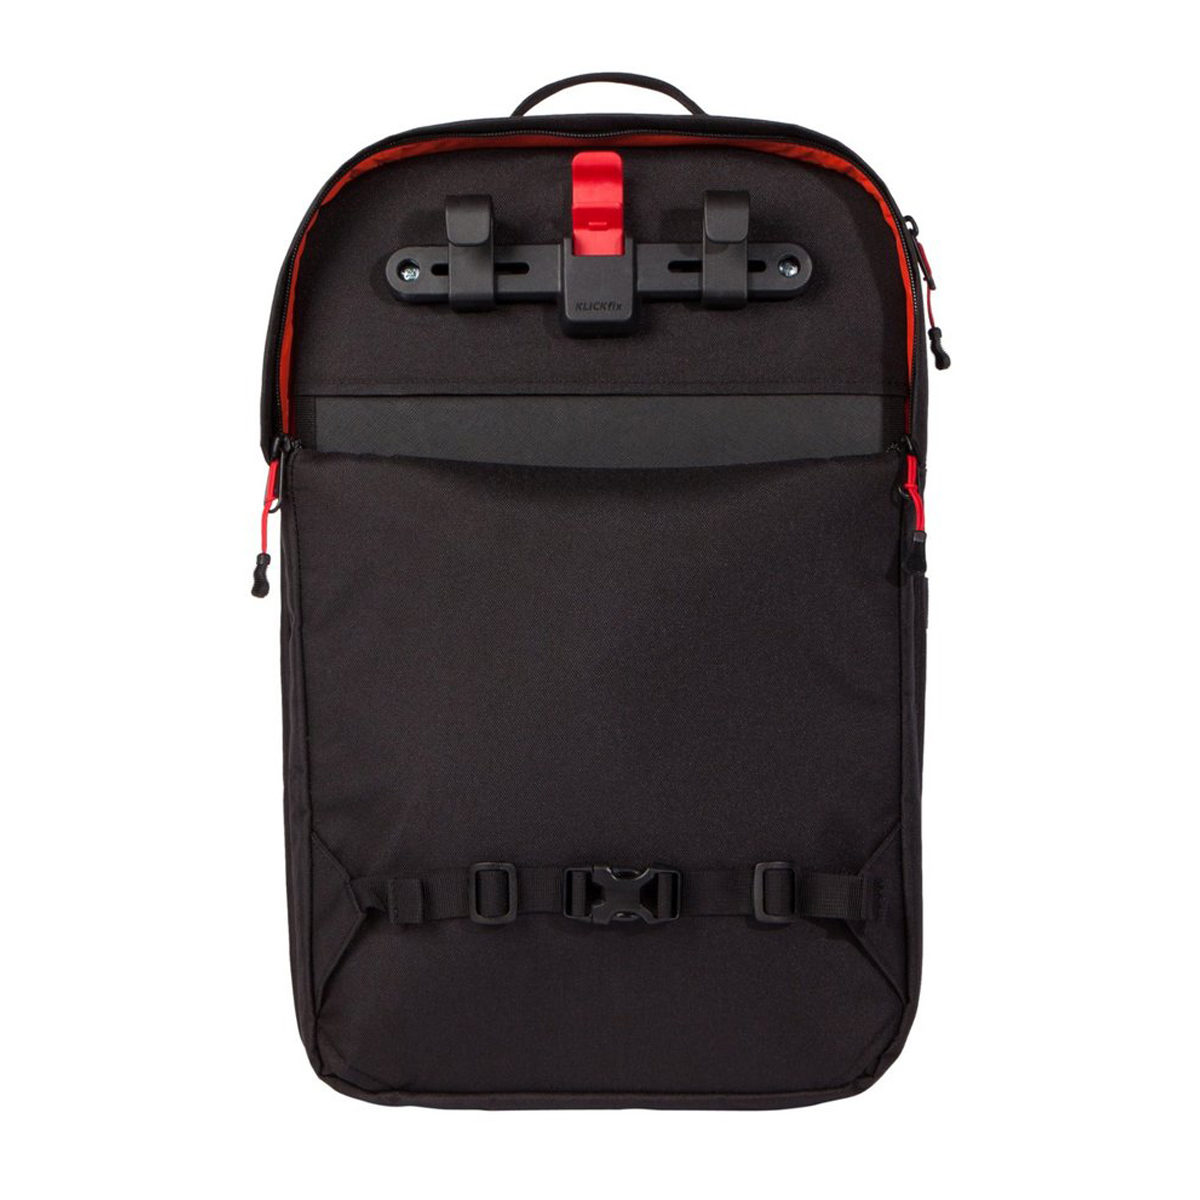 Pannier Backpack Convertible – Plus 7